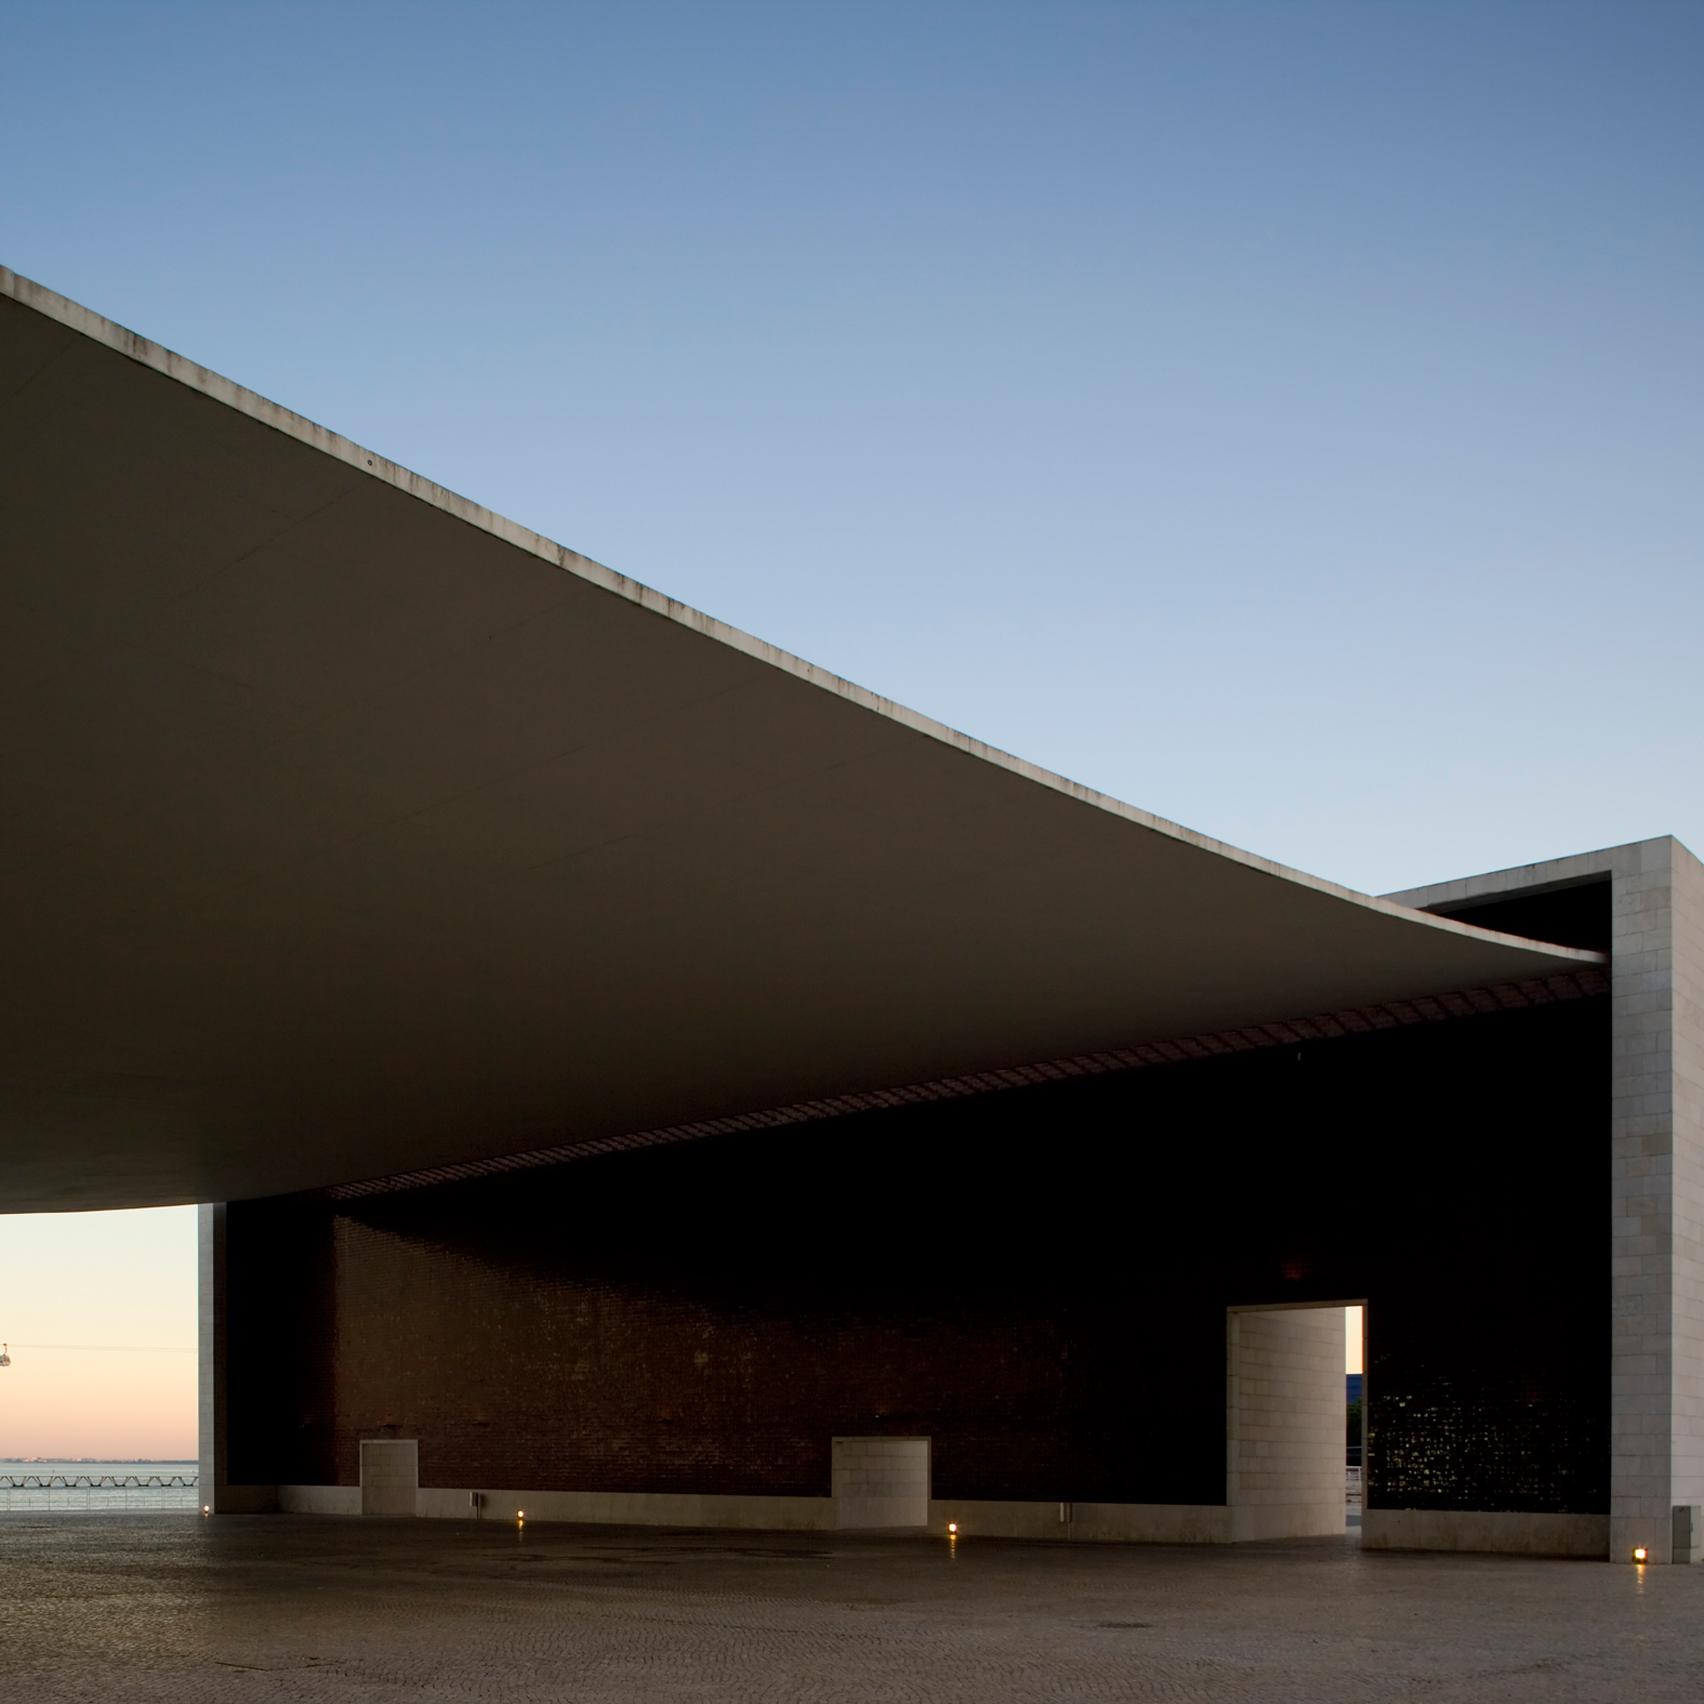 alvaro-siza-sacro-maxxii-architecture-roundups-museums-rome_dezeen_sq